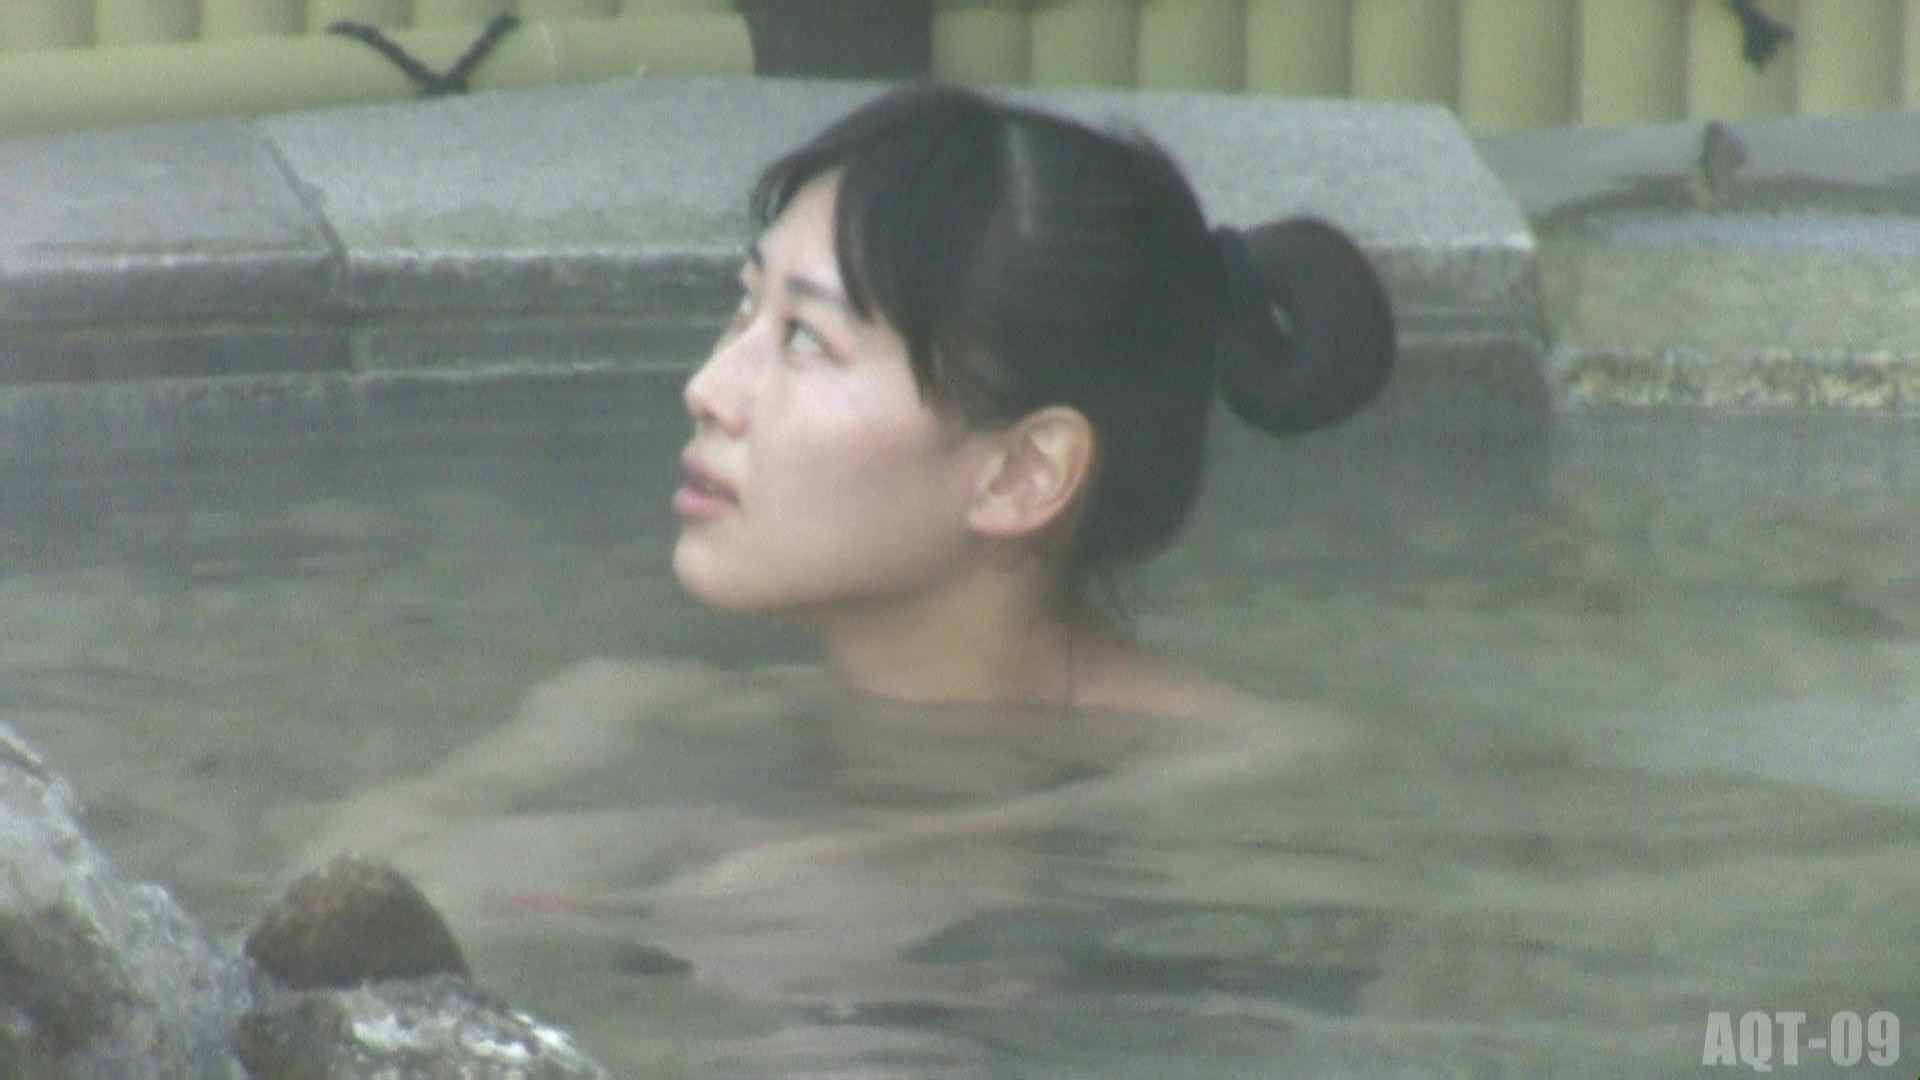 Aquaな露天風呂Vol.785 露天風呂編  110PIX 2